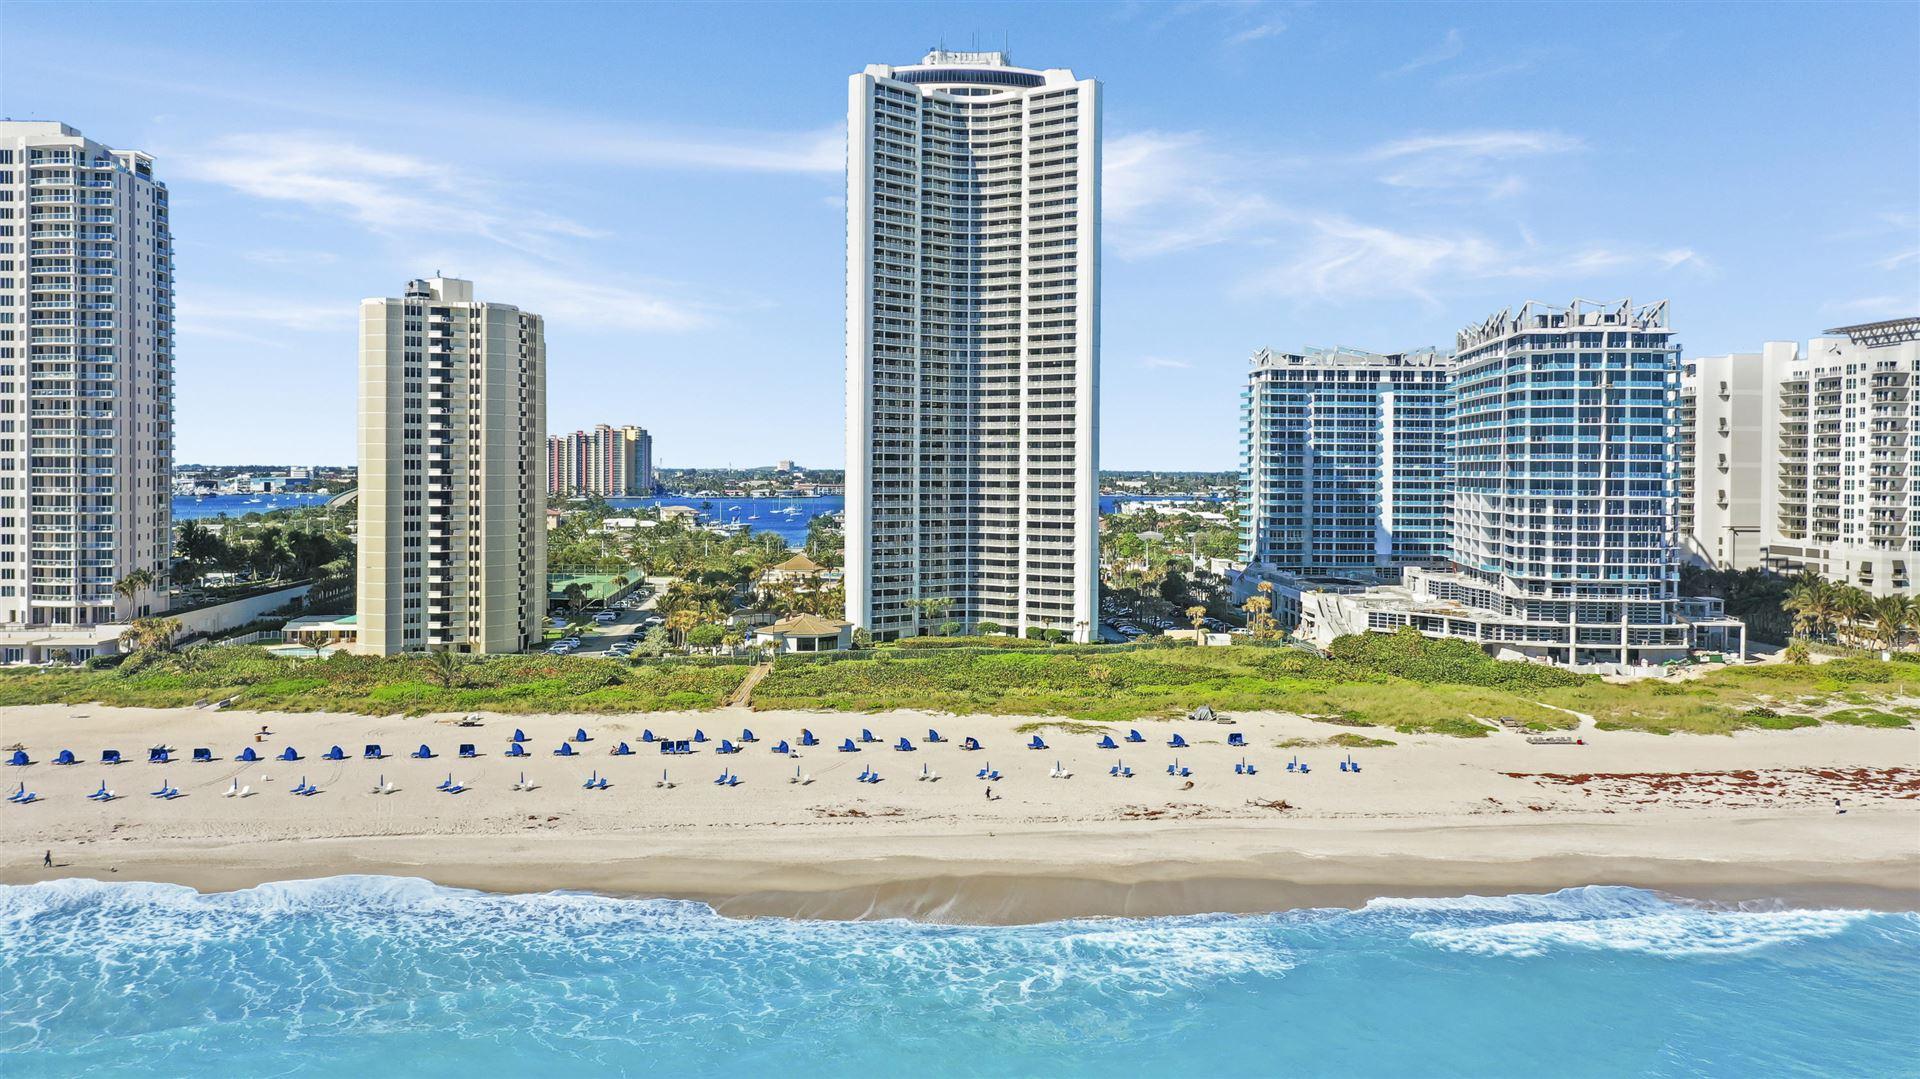 Photo of 3000 N Ocean Drive #35h, Riviera Beach, FL 33404 (MLS # RX-10637464)